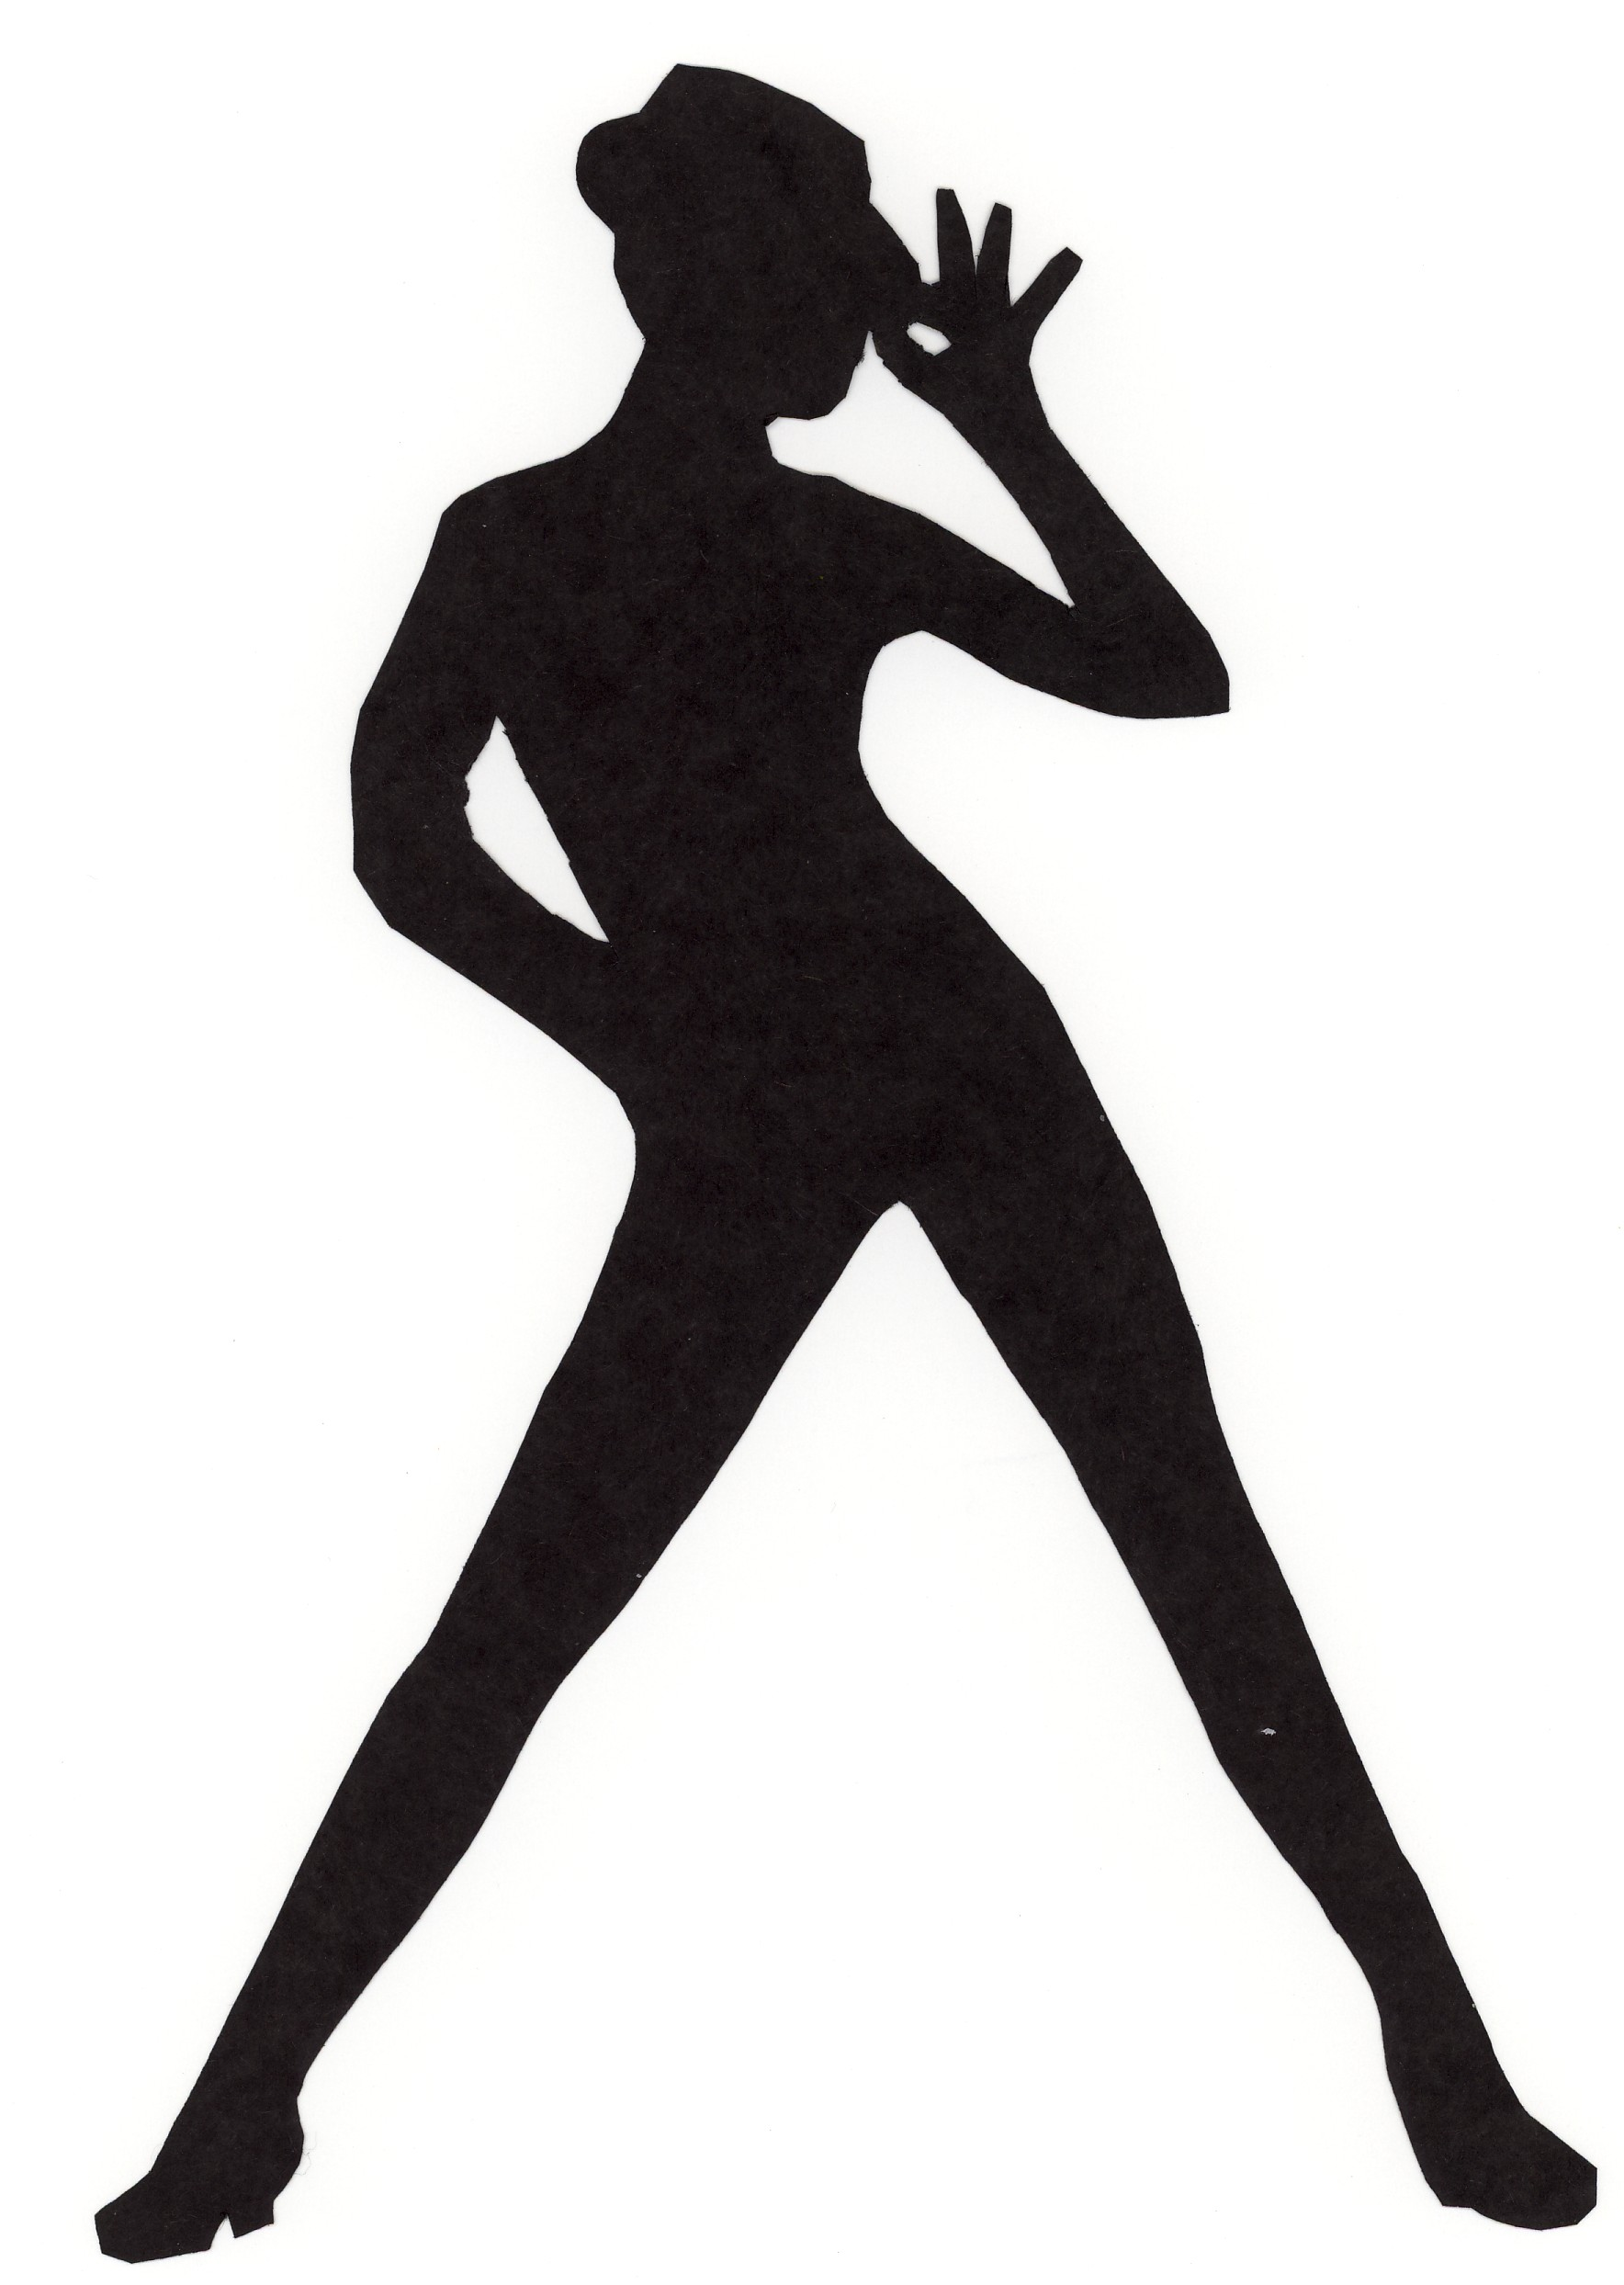 Jazz Dancer Clipart Silhouette | Clipart Panda - Free Clipart Images